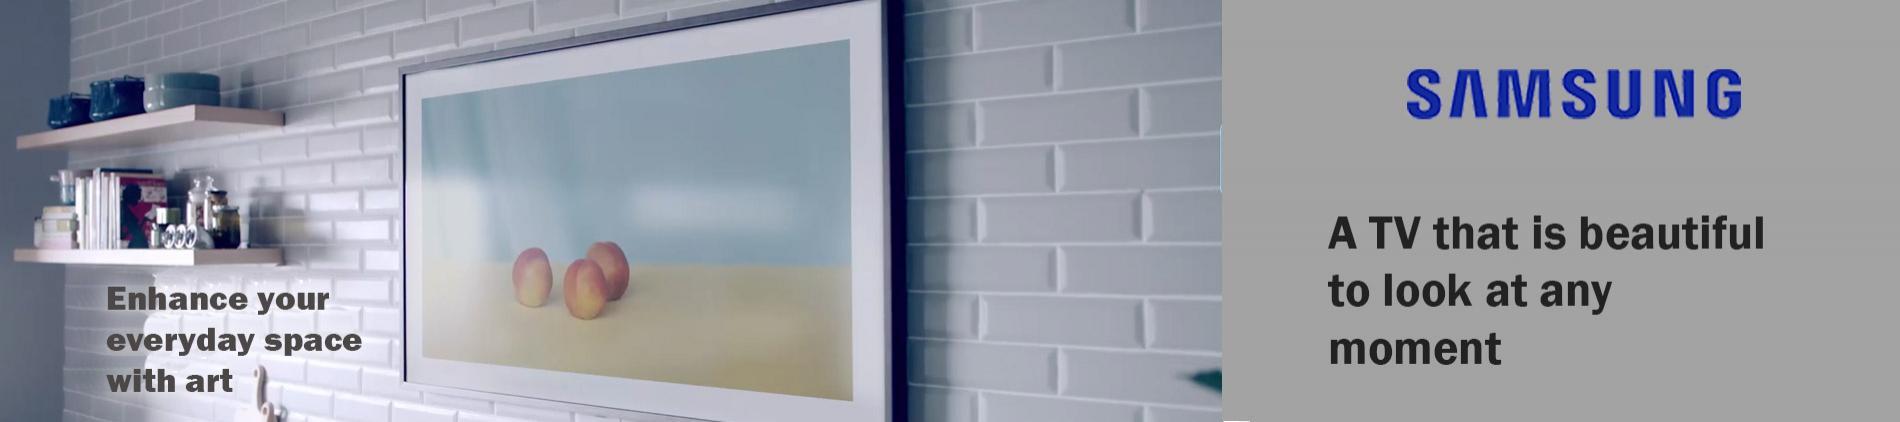 Samsung,frame,tv